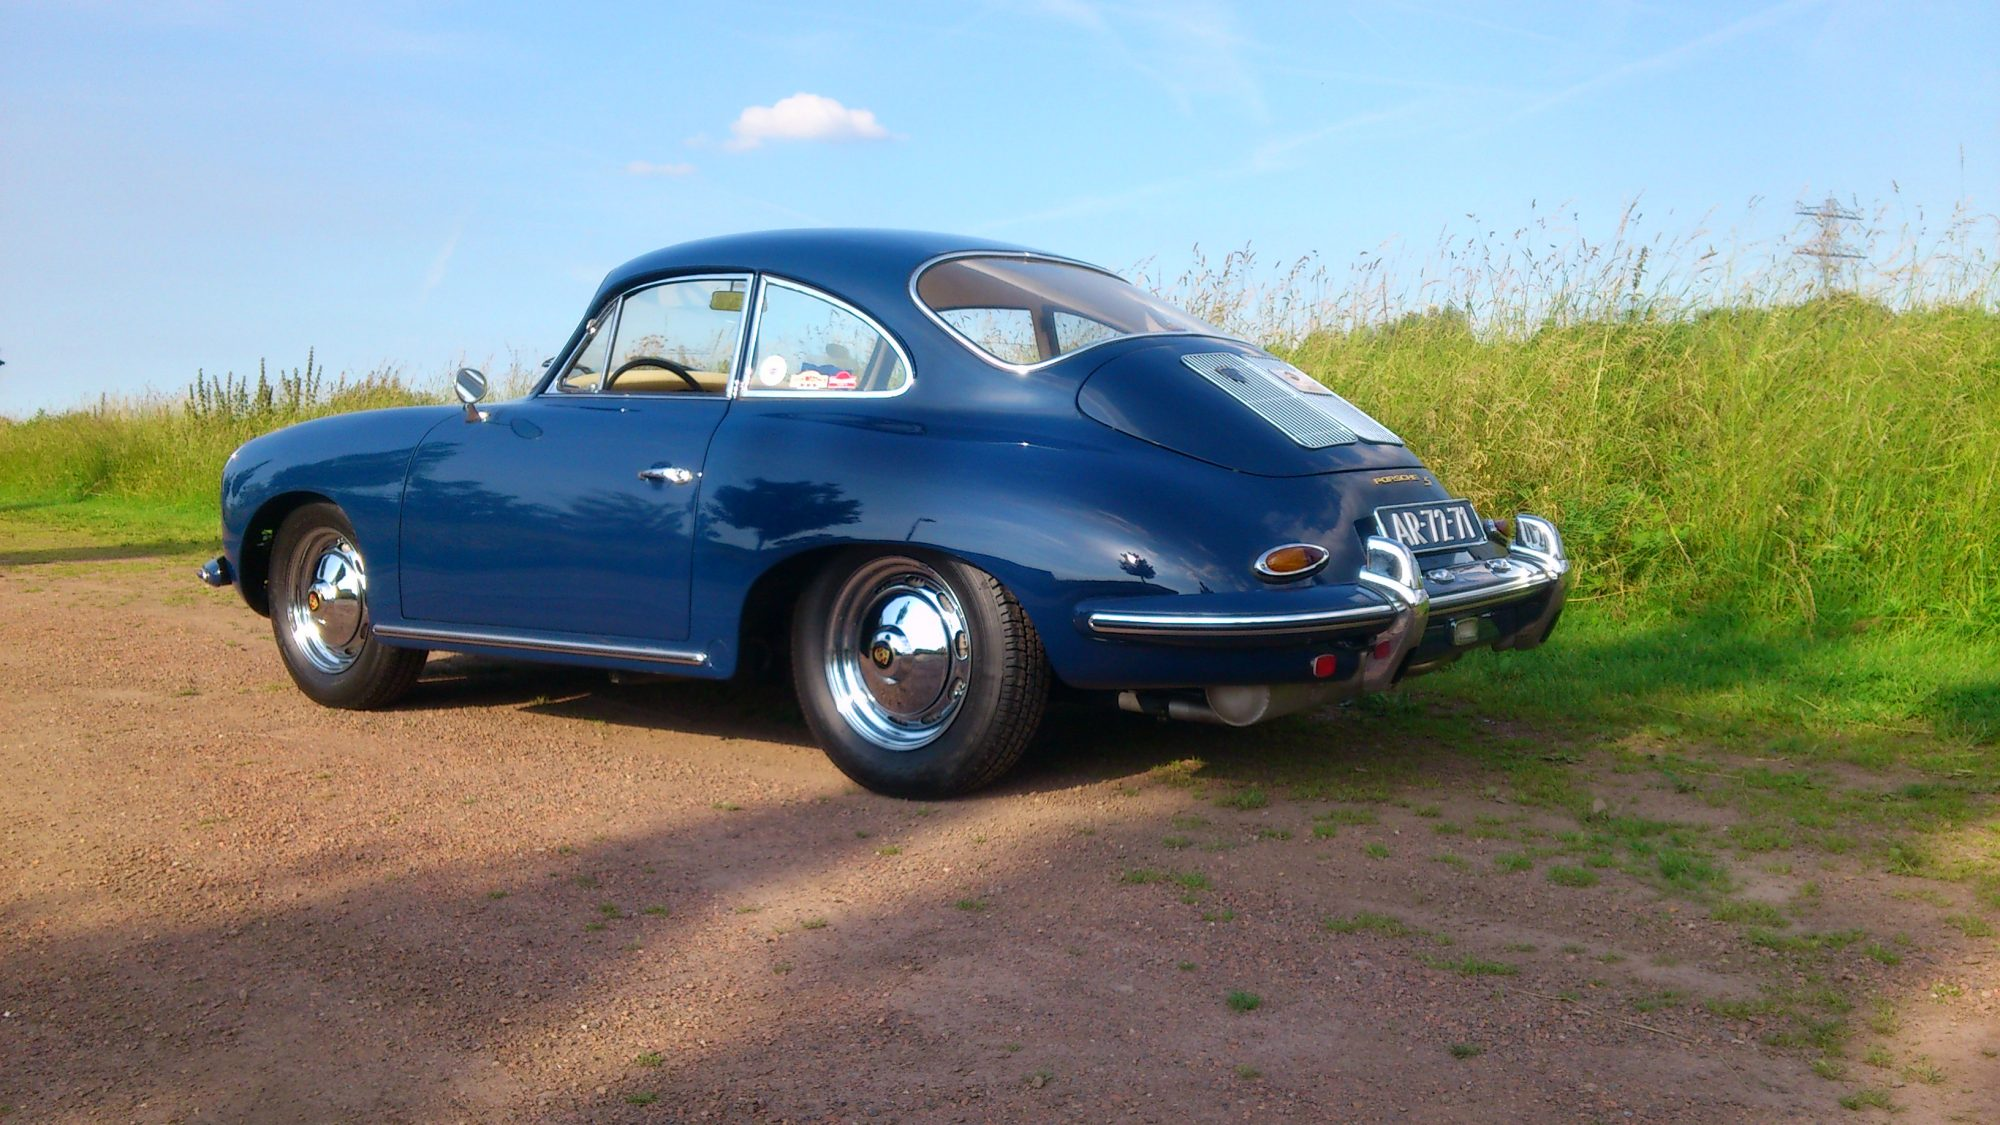 Porsche 356 For Sale >> Porsche 356B - Classic Sports Cars Holland